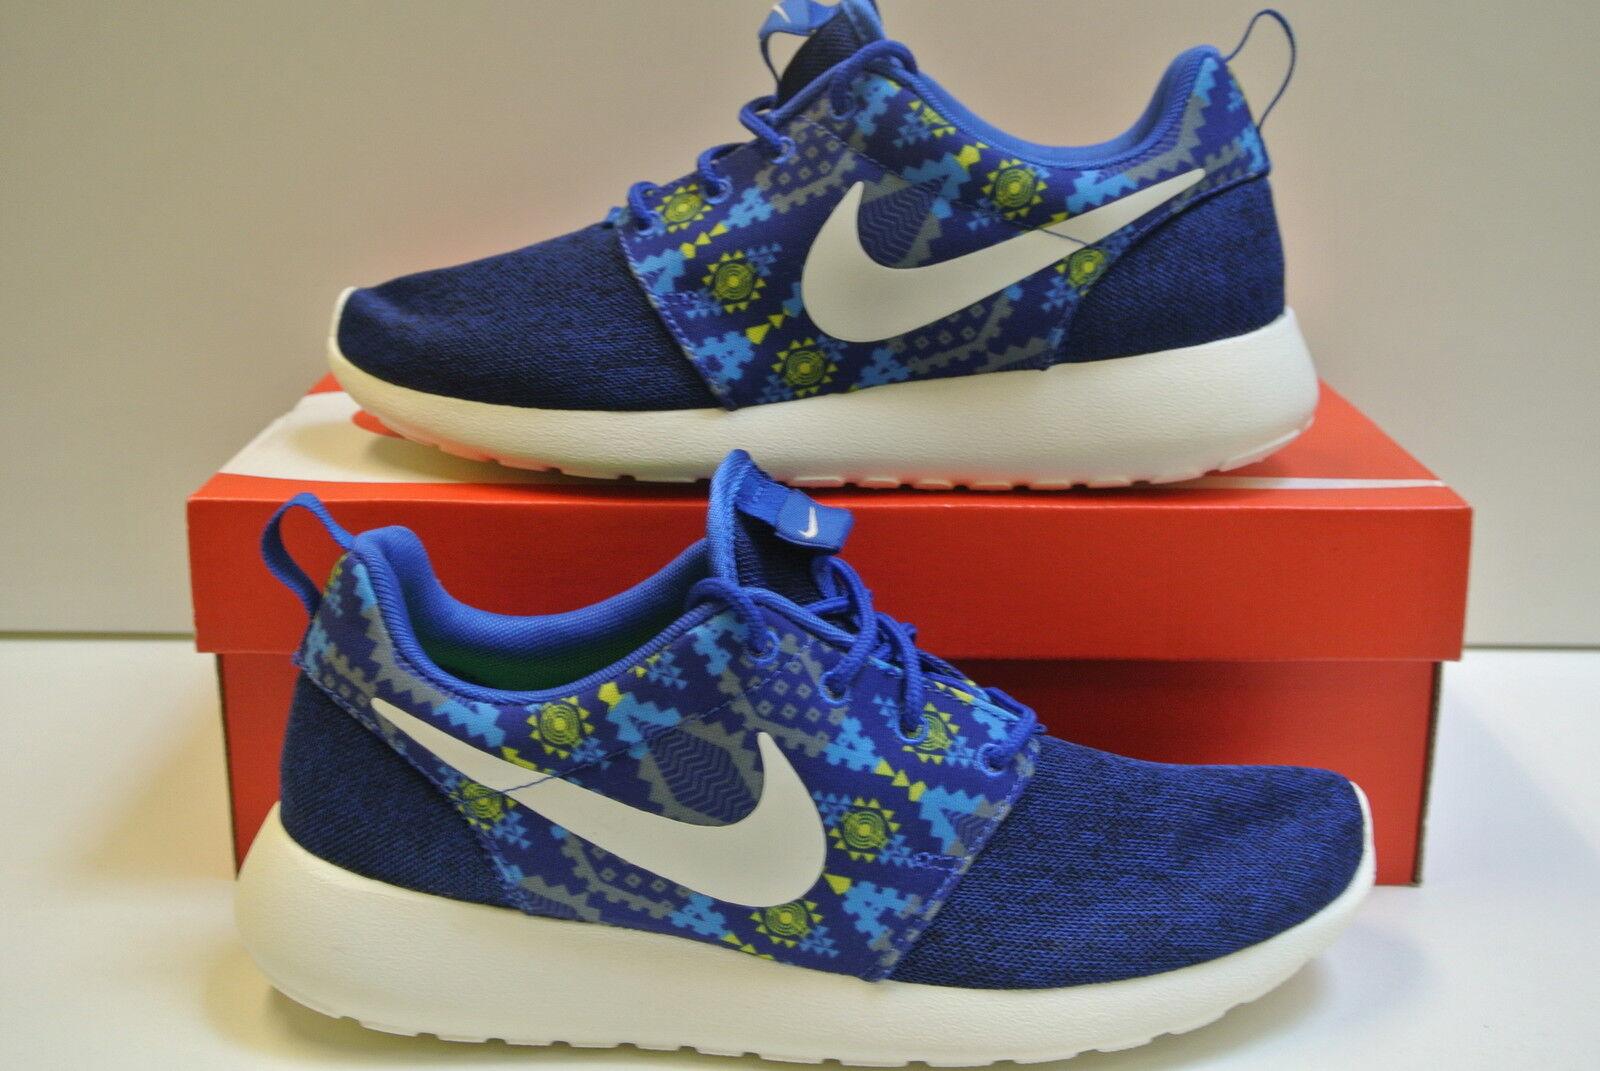 Nike roshe one Print Rosherun talla elegibles 410 nuevo & OVP 655206 410 elegibles 02f284